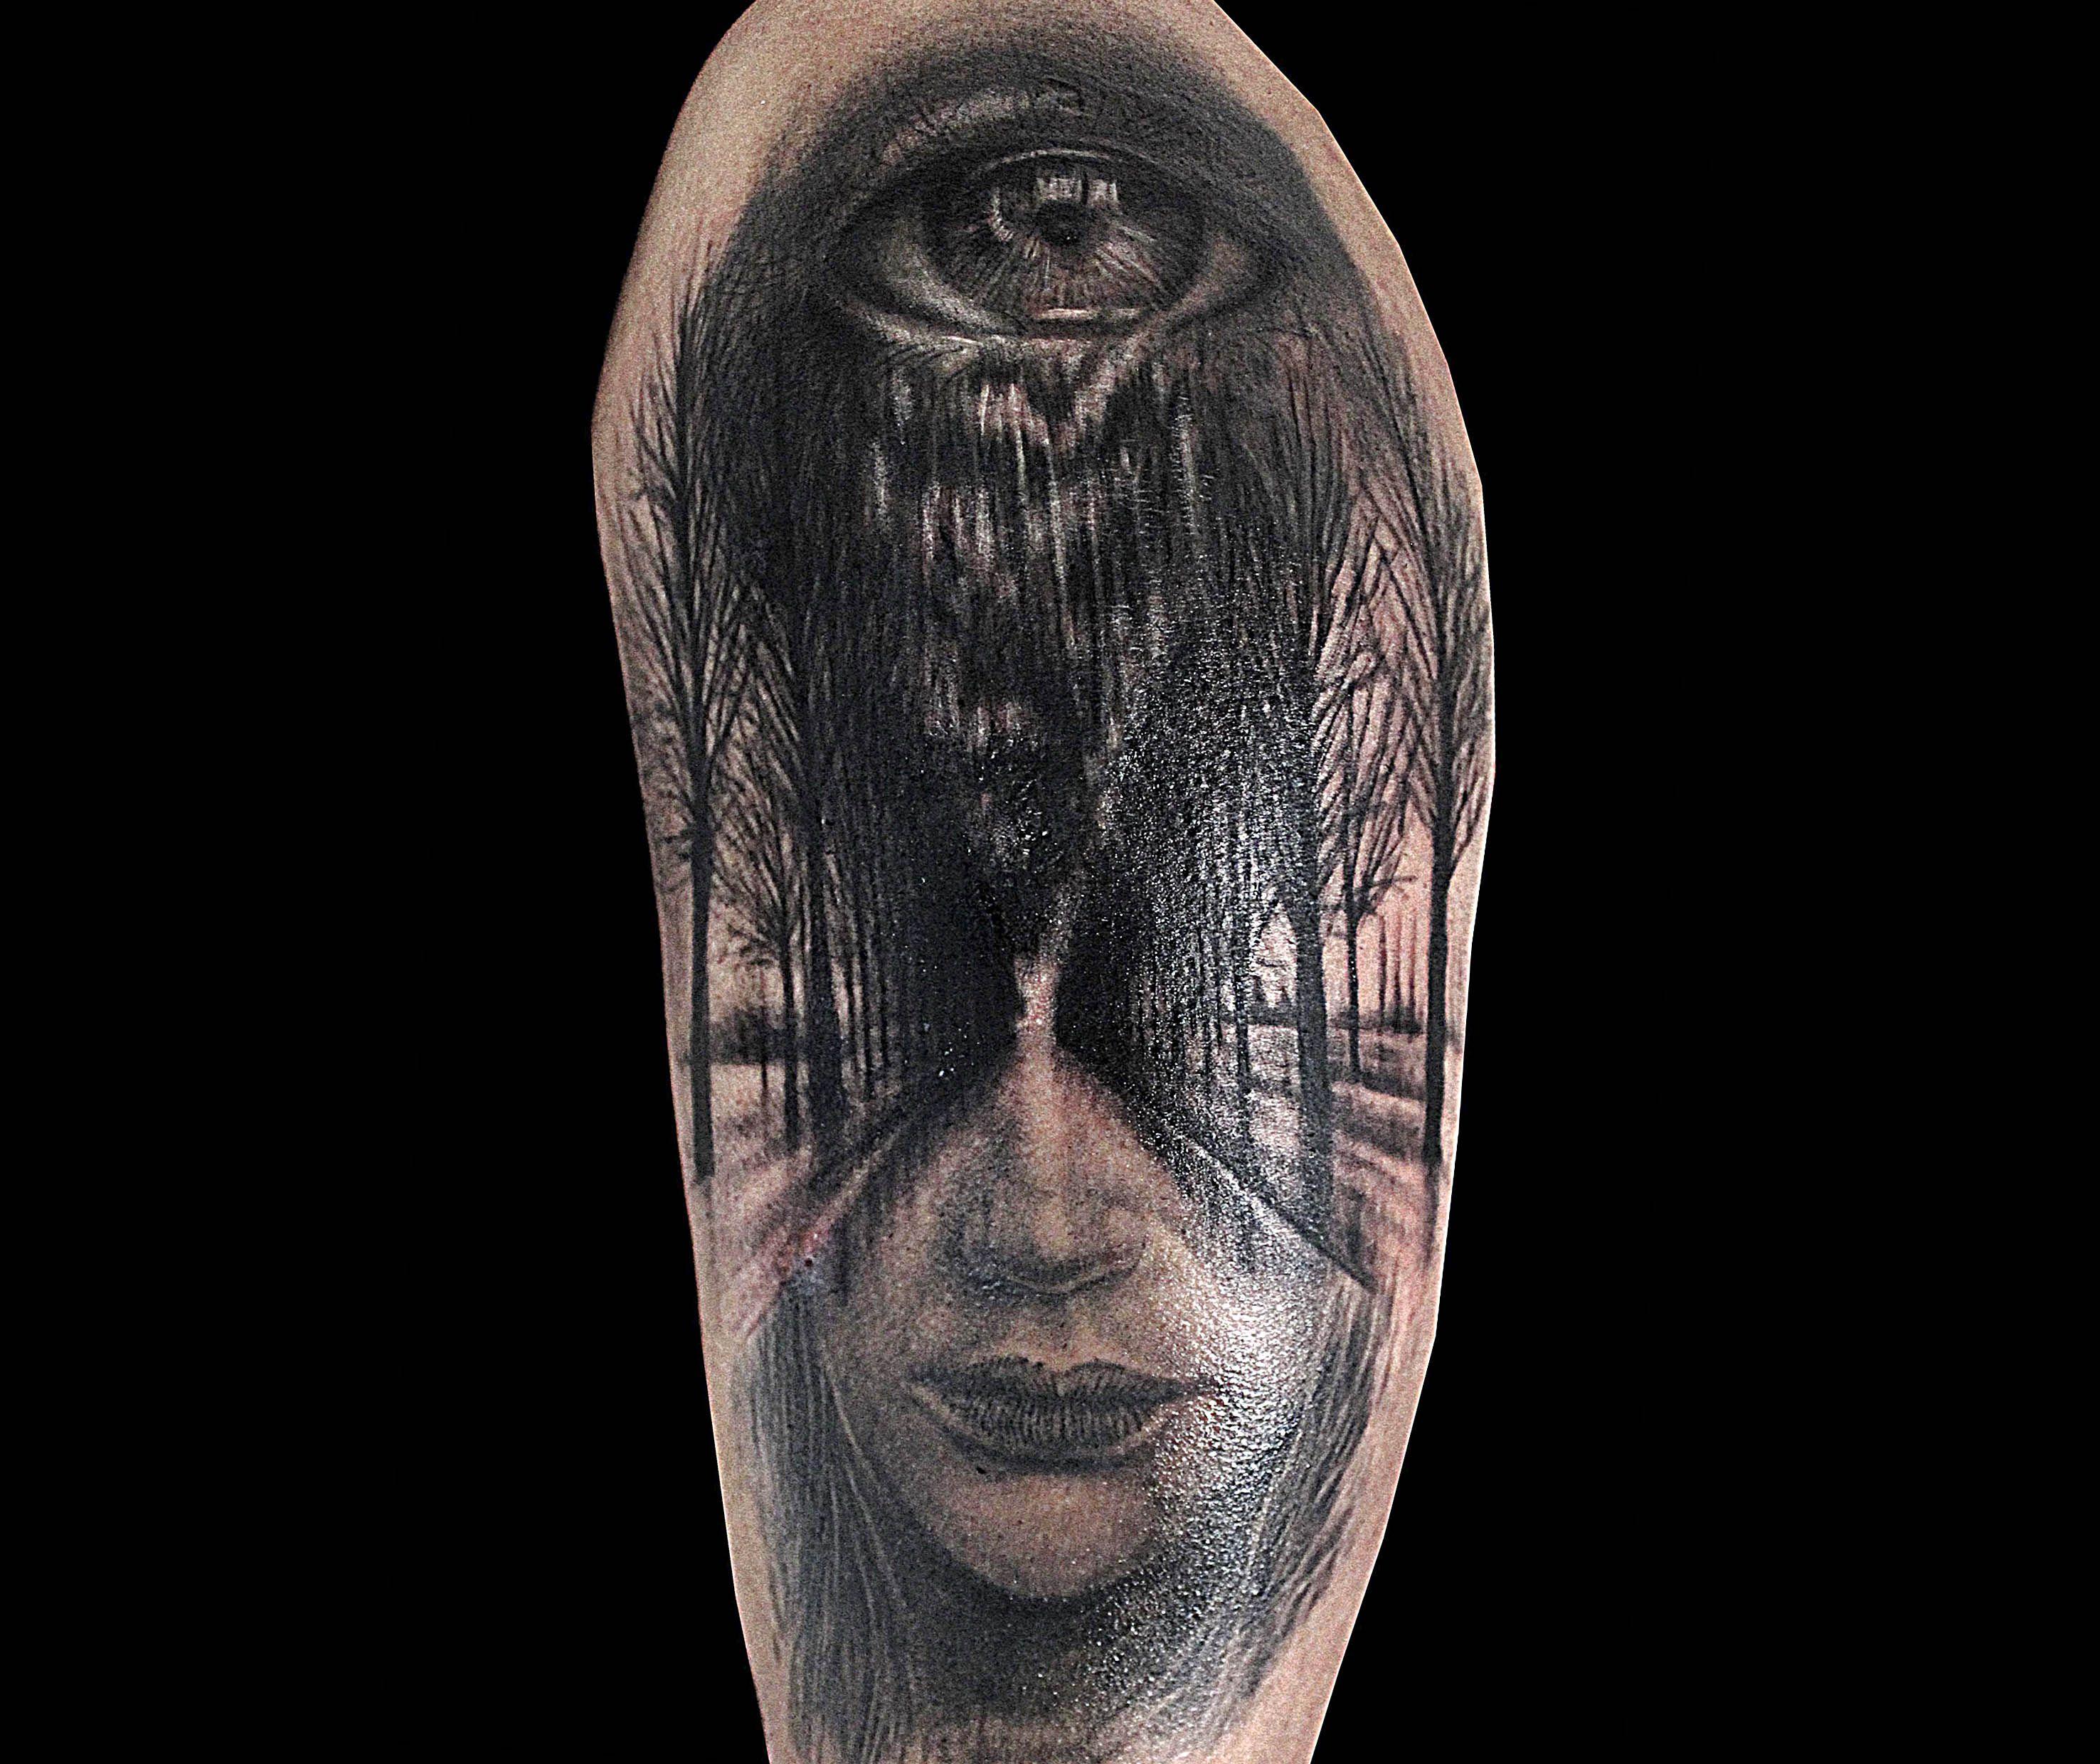 Eyes, trees, half face tattoo